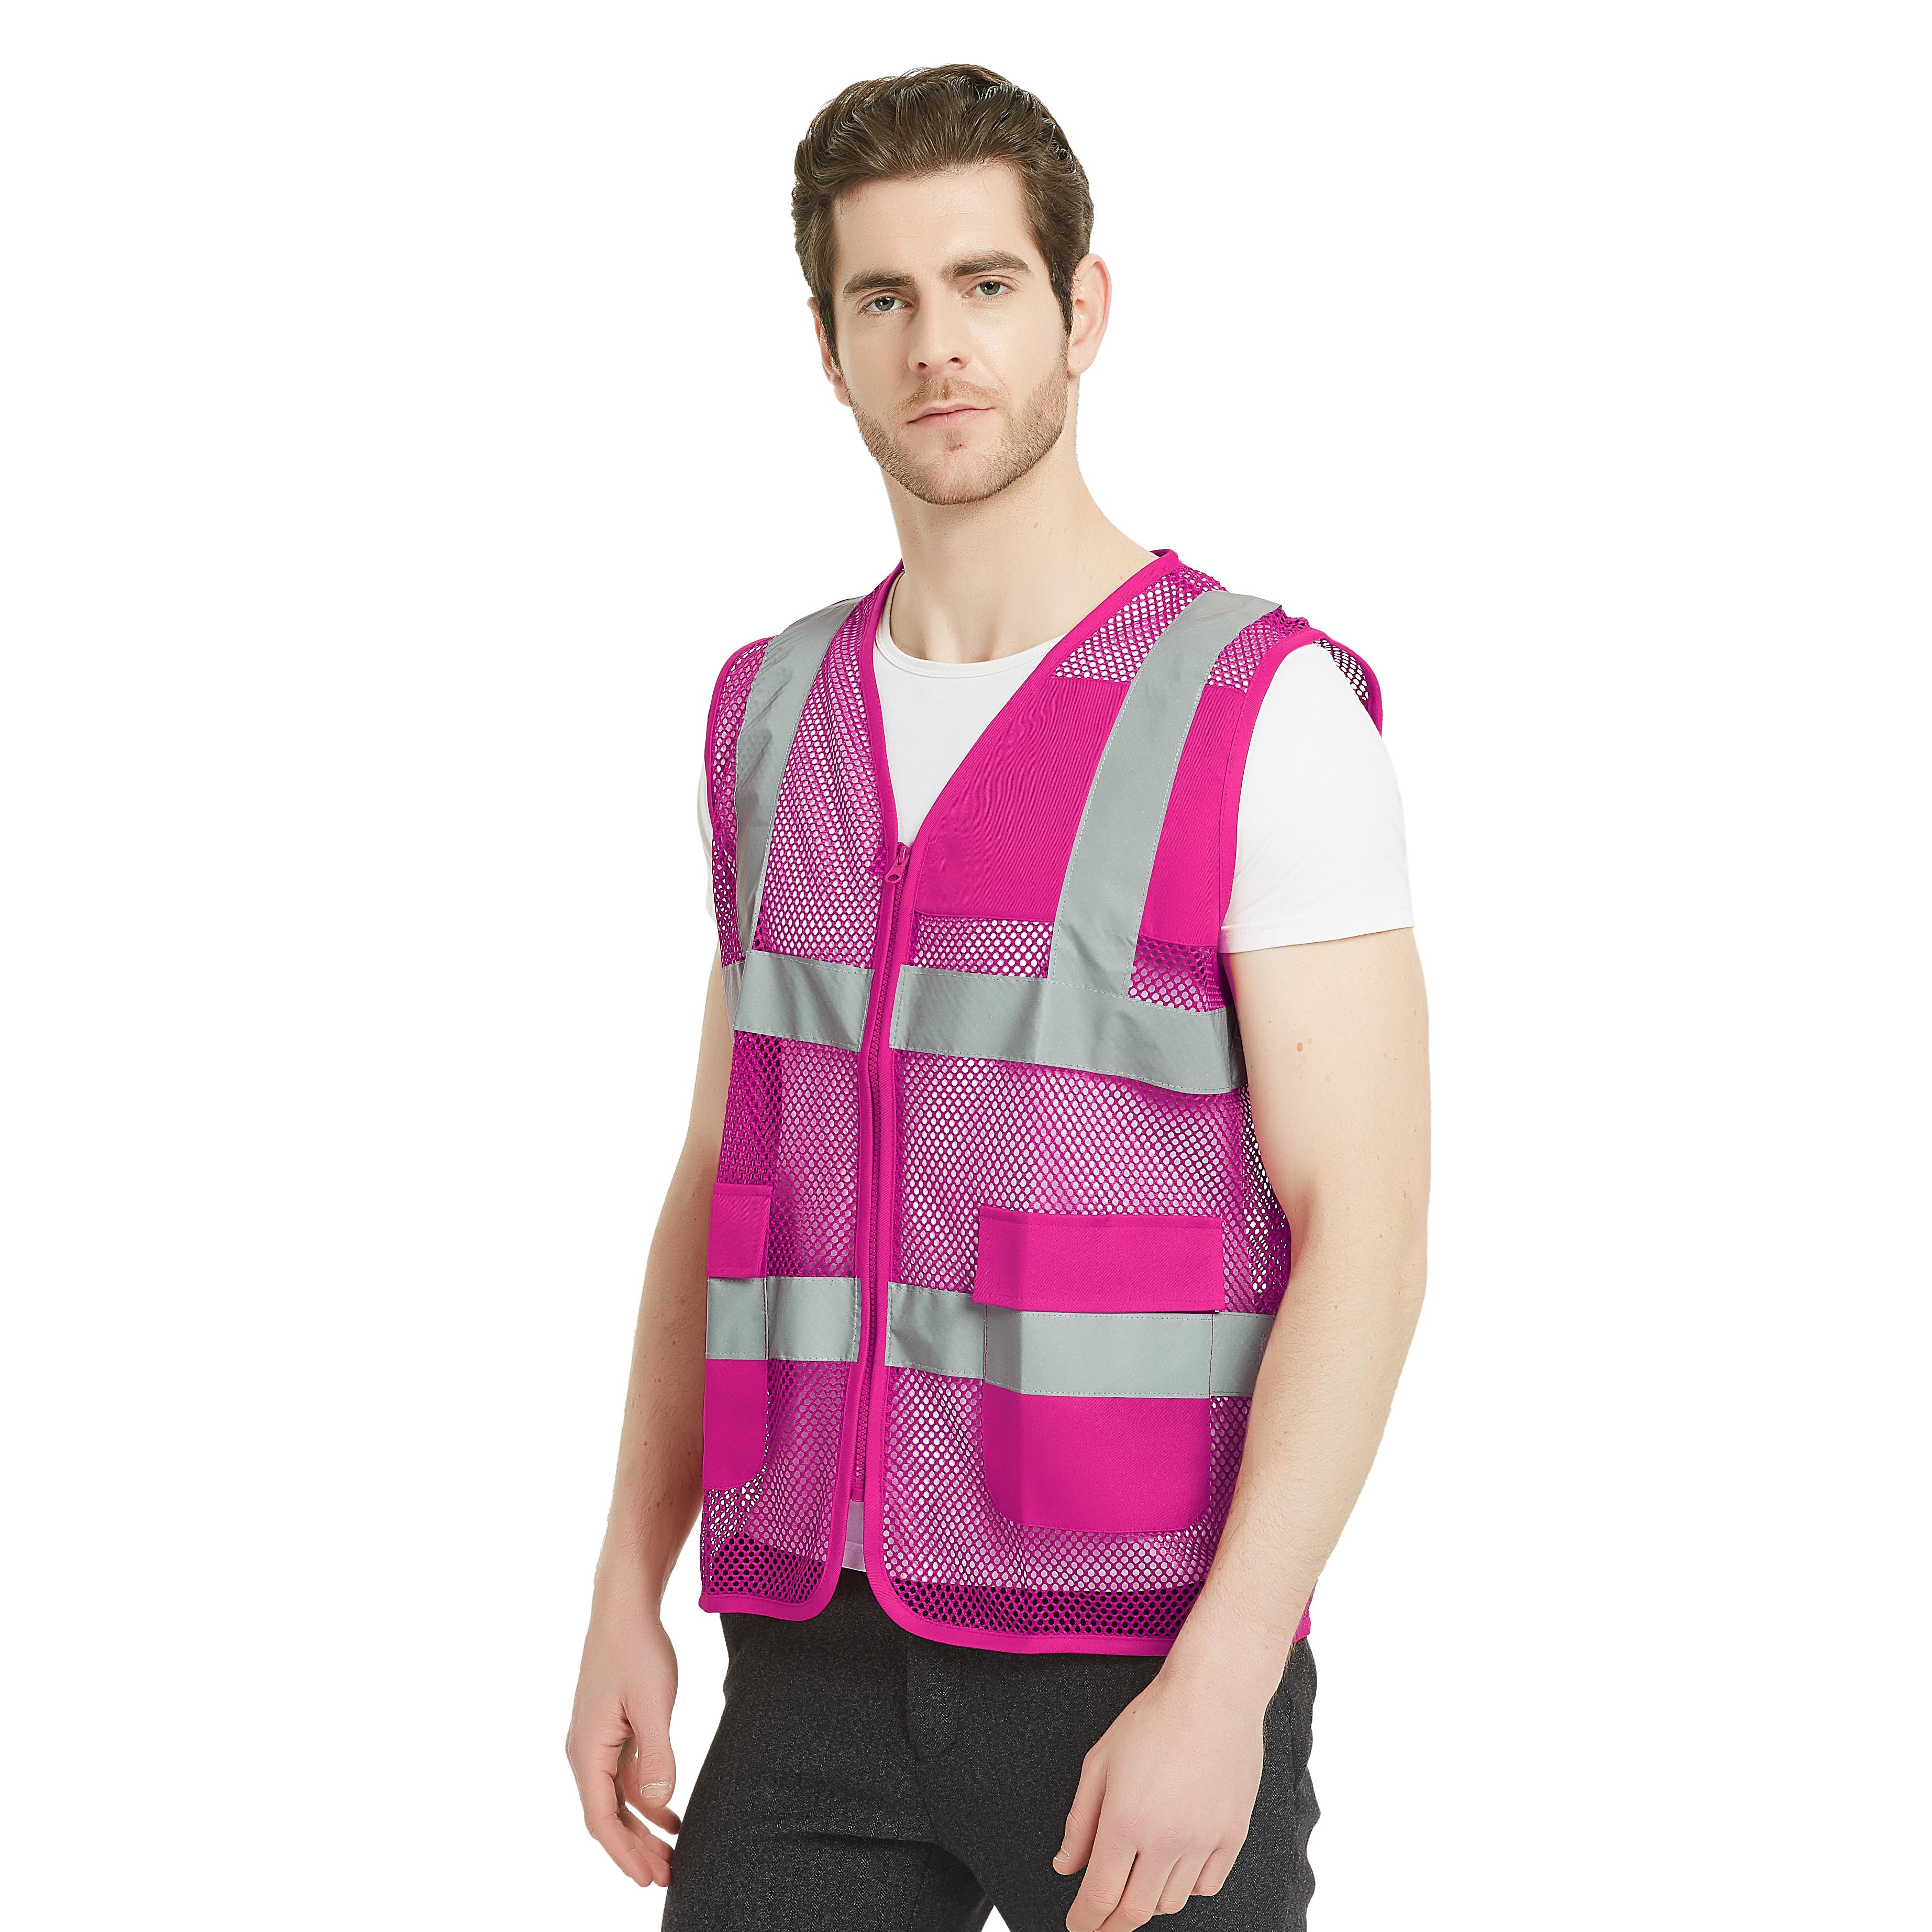 GOGO Unisex Mesh Volunteer Safety Vest